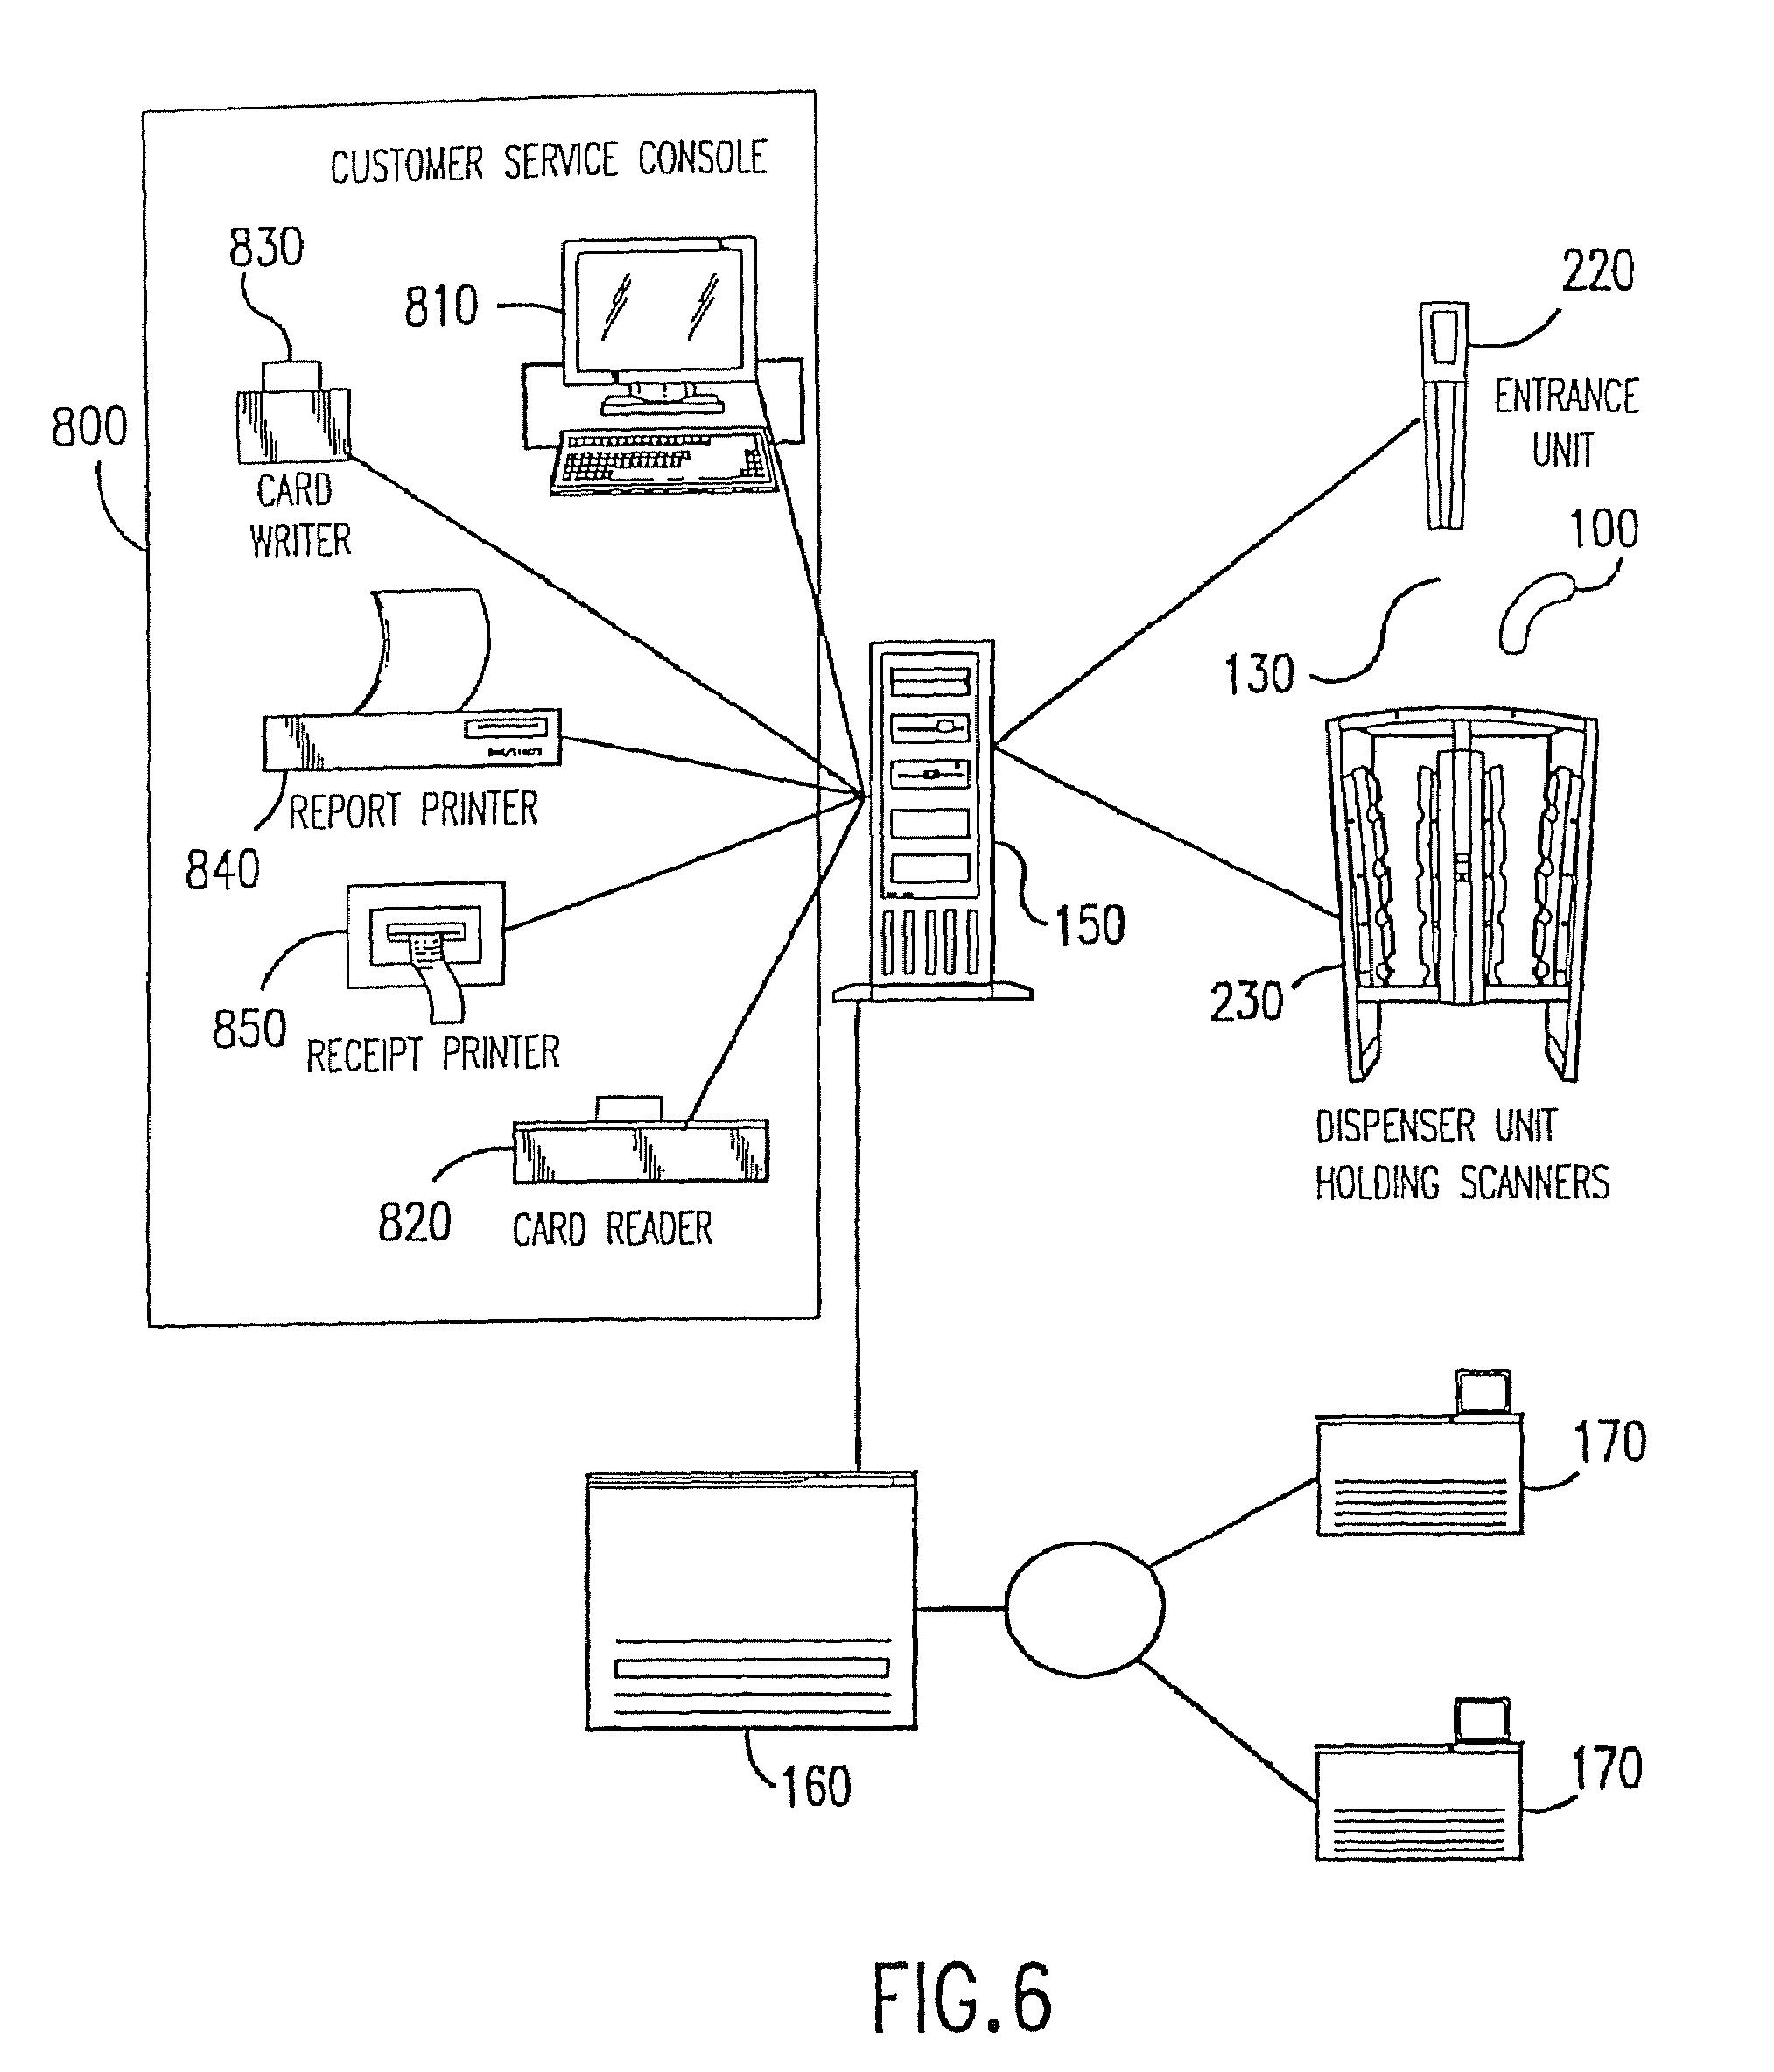 Patent US 7,195,157 B2